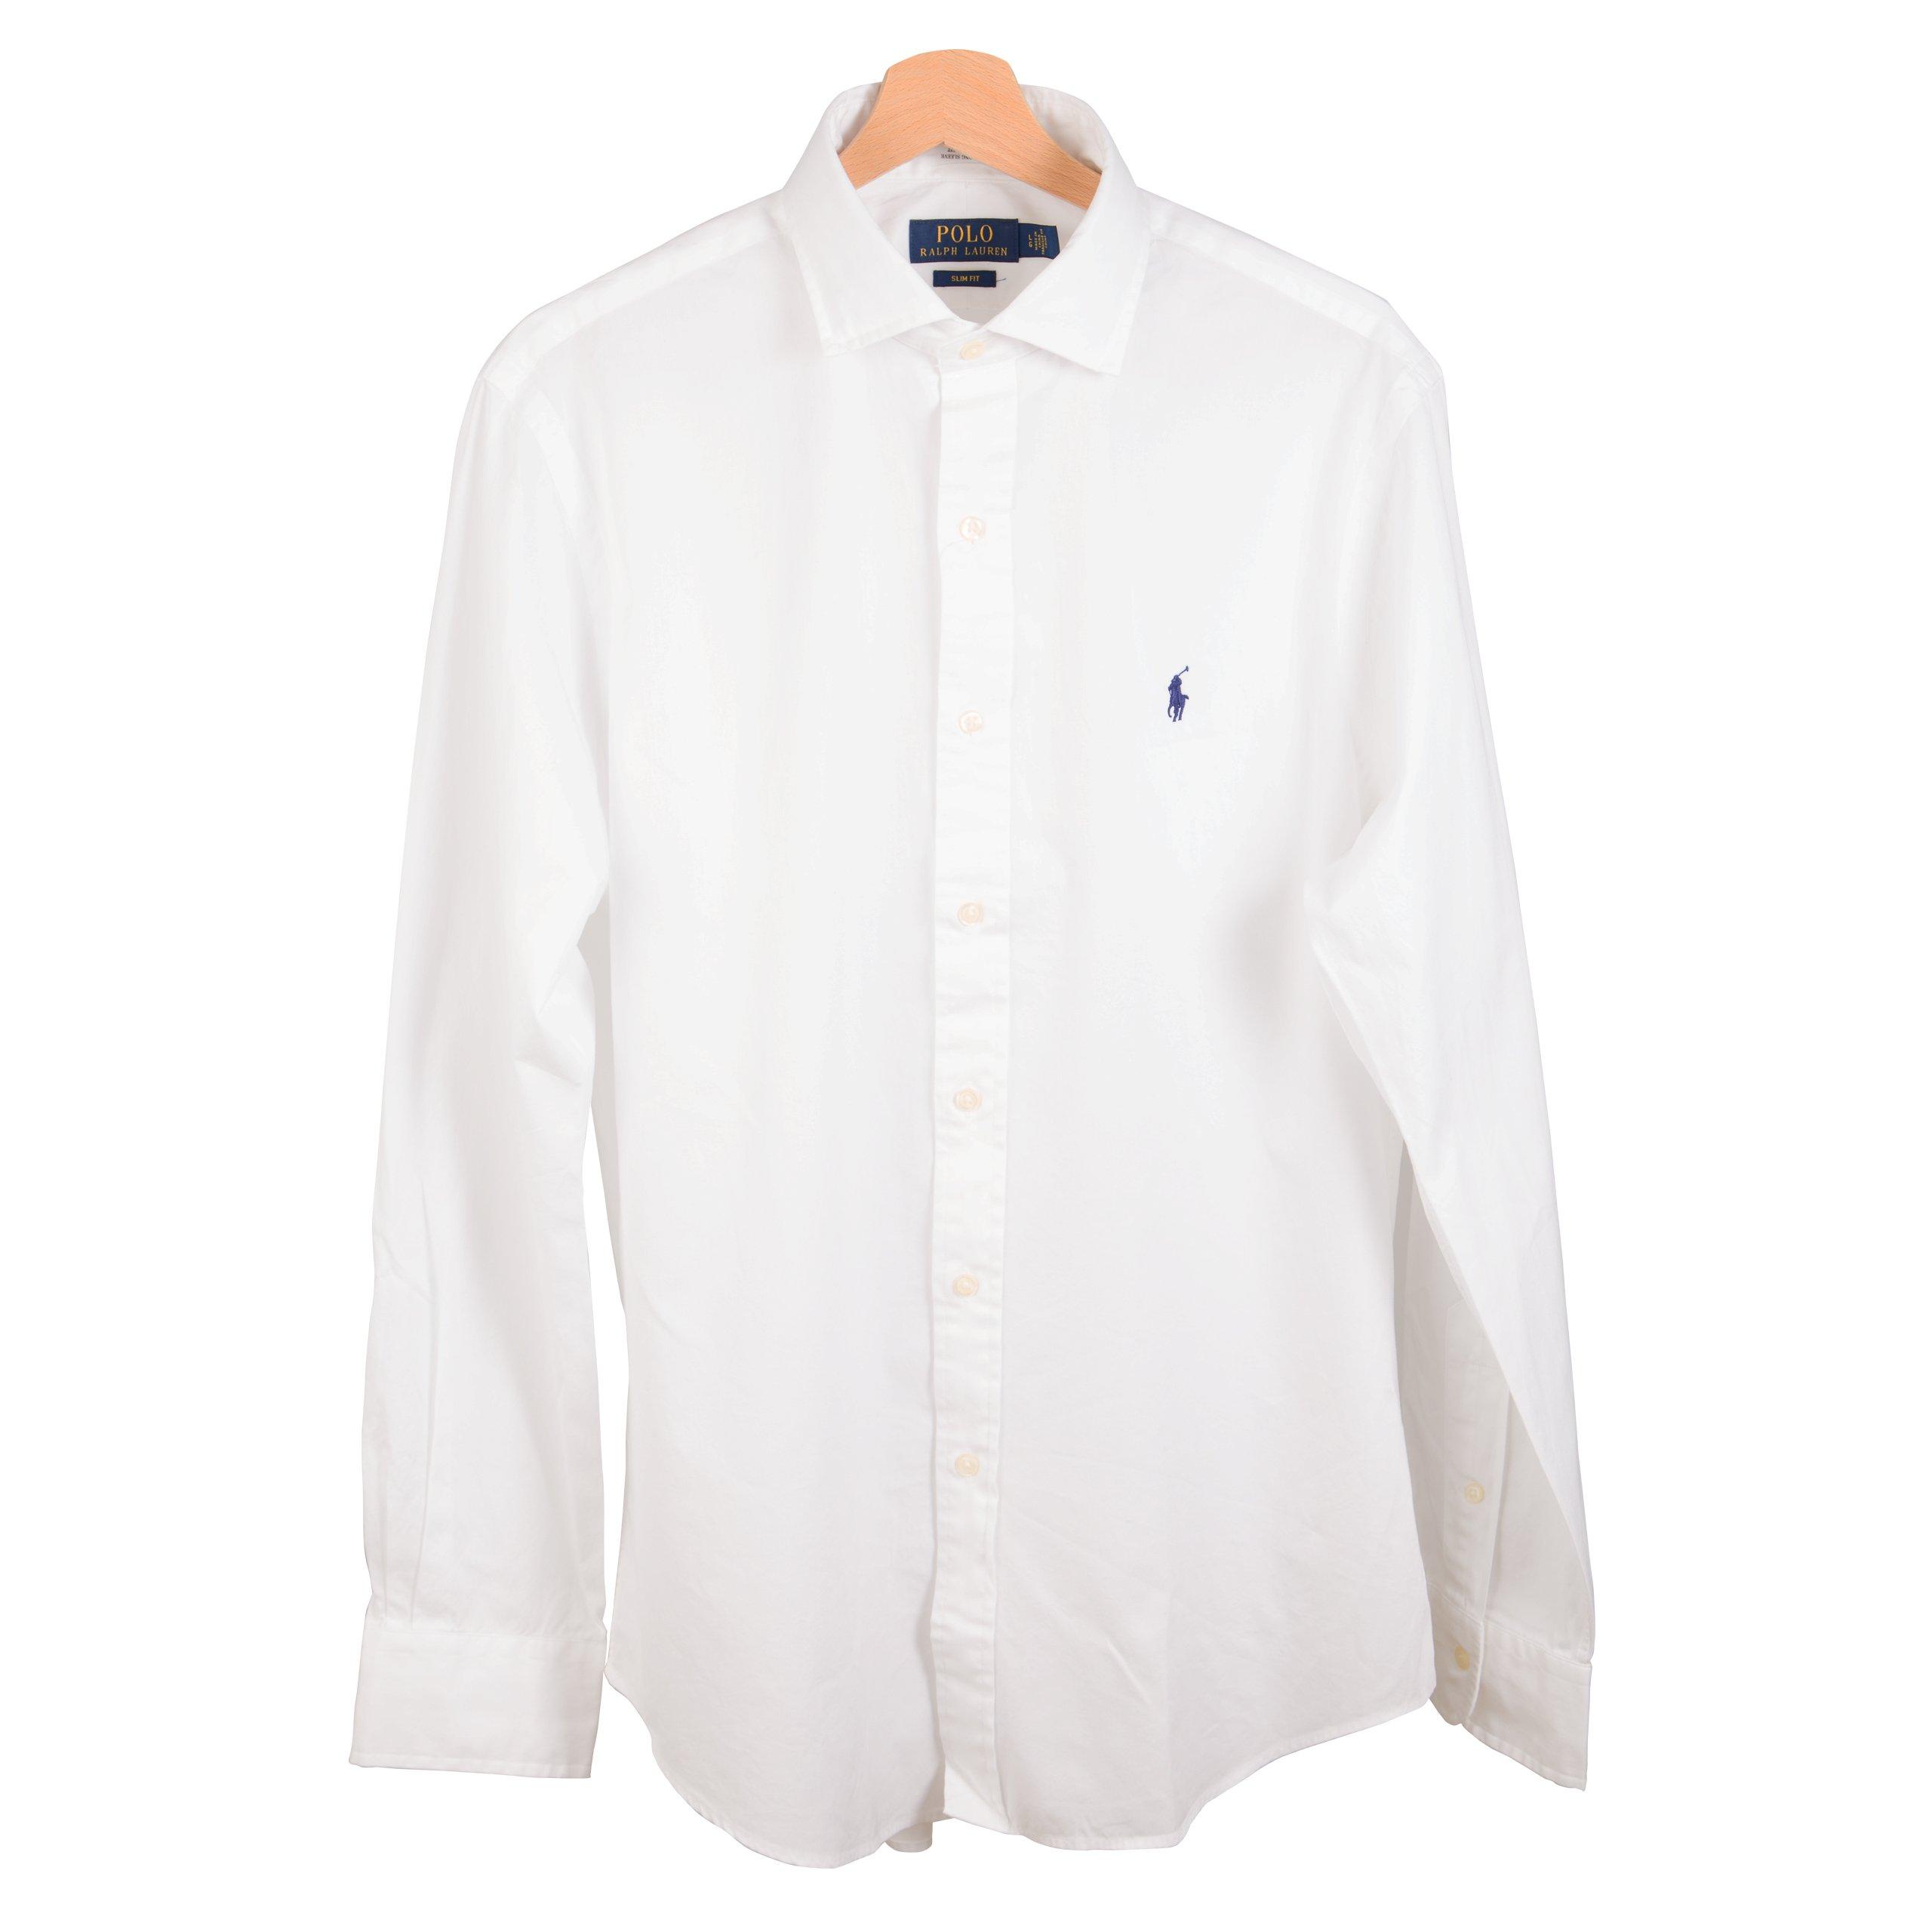 7333b41be RALPH LAUREN POLO koszula męska biała SLIM FIT XXL - 7157836053 ...